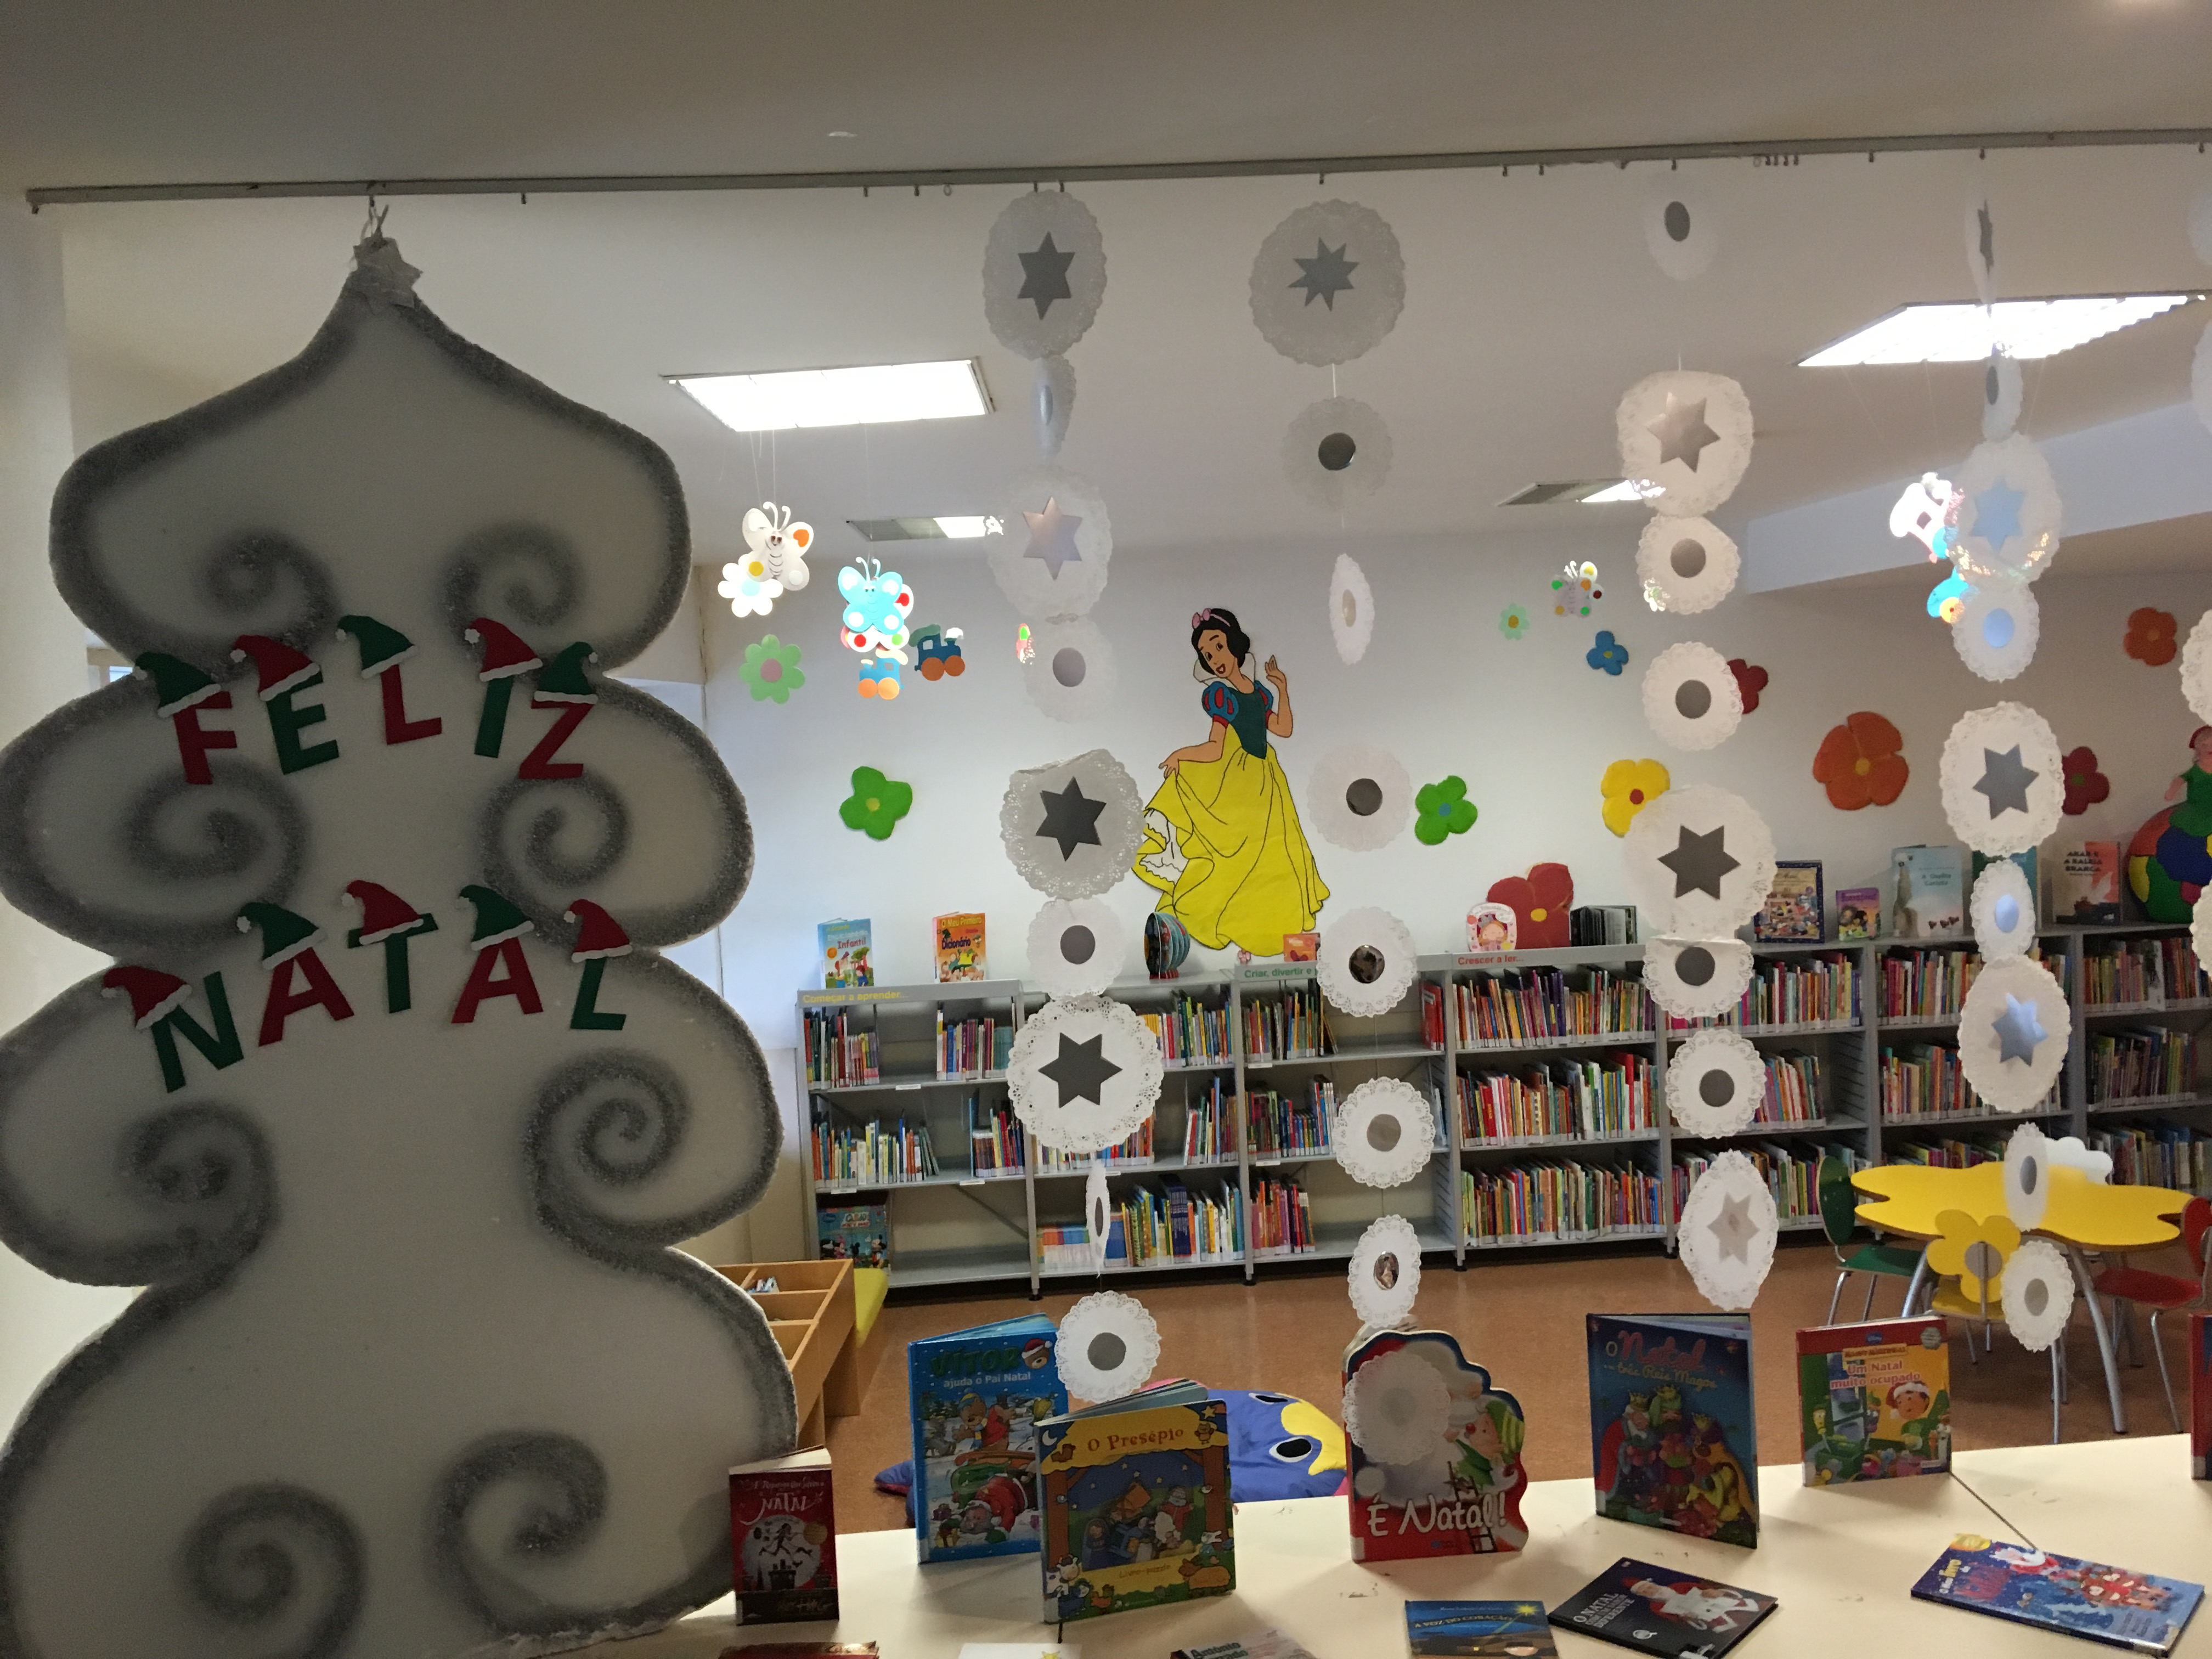 Visita à Biblioteca, Centro Histórico e Teatro - Edifacoop